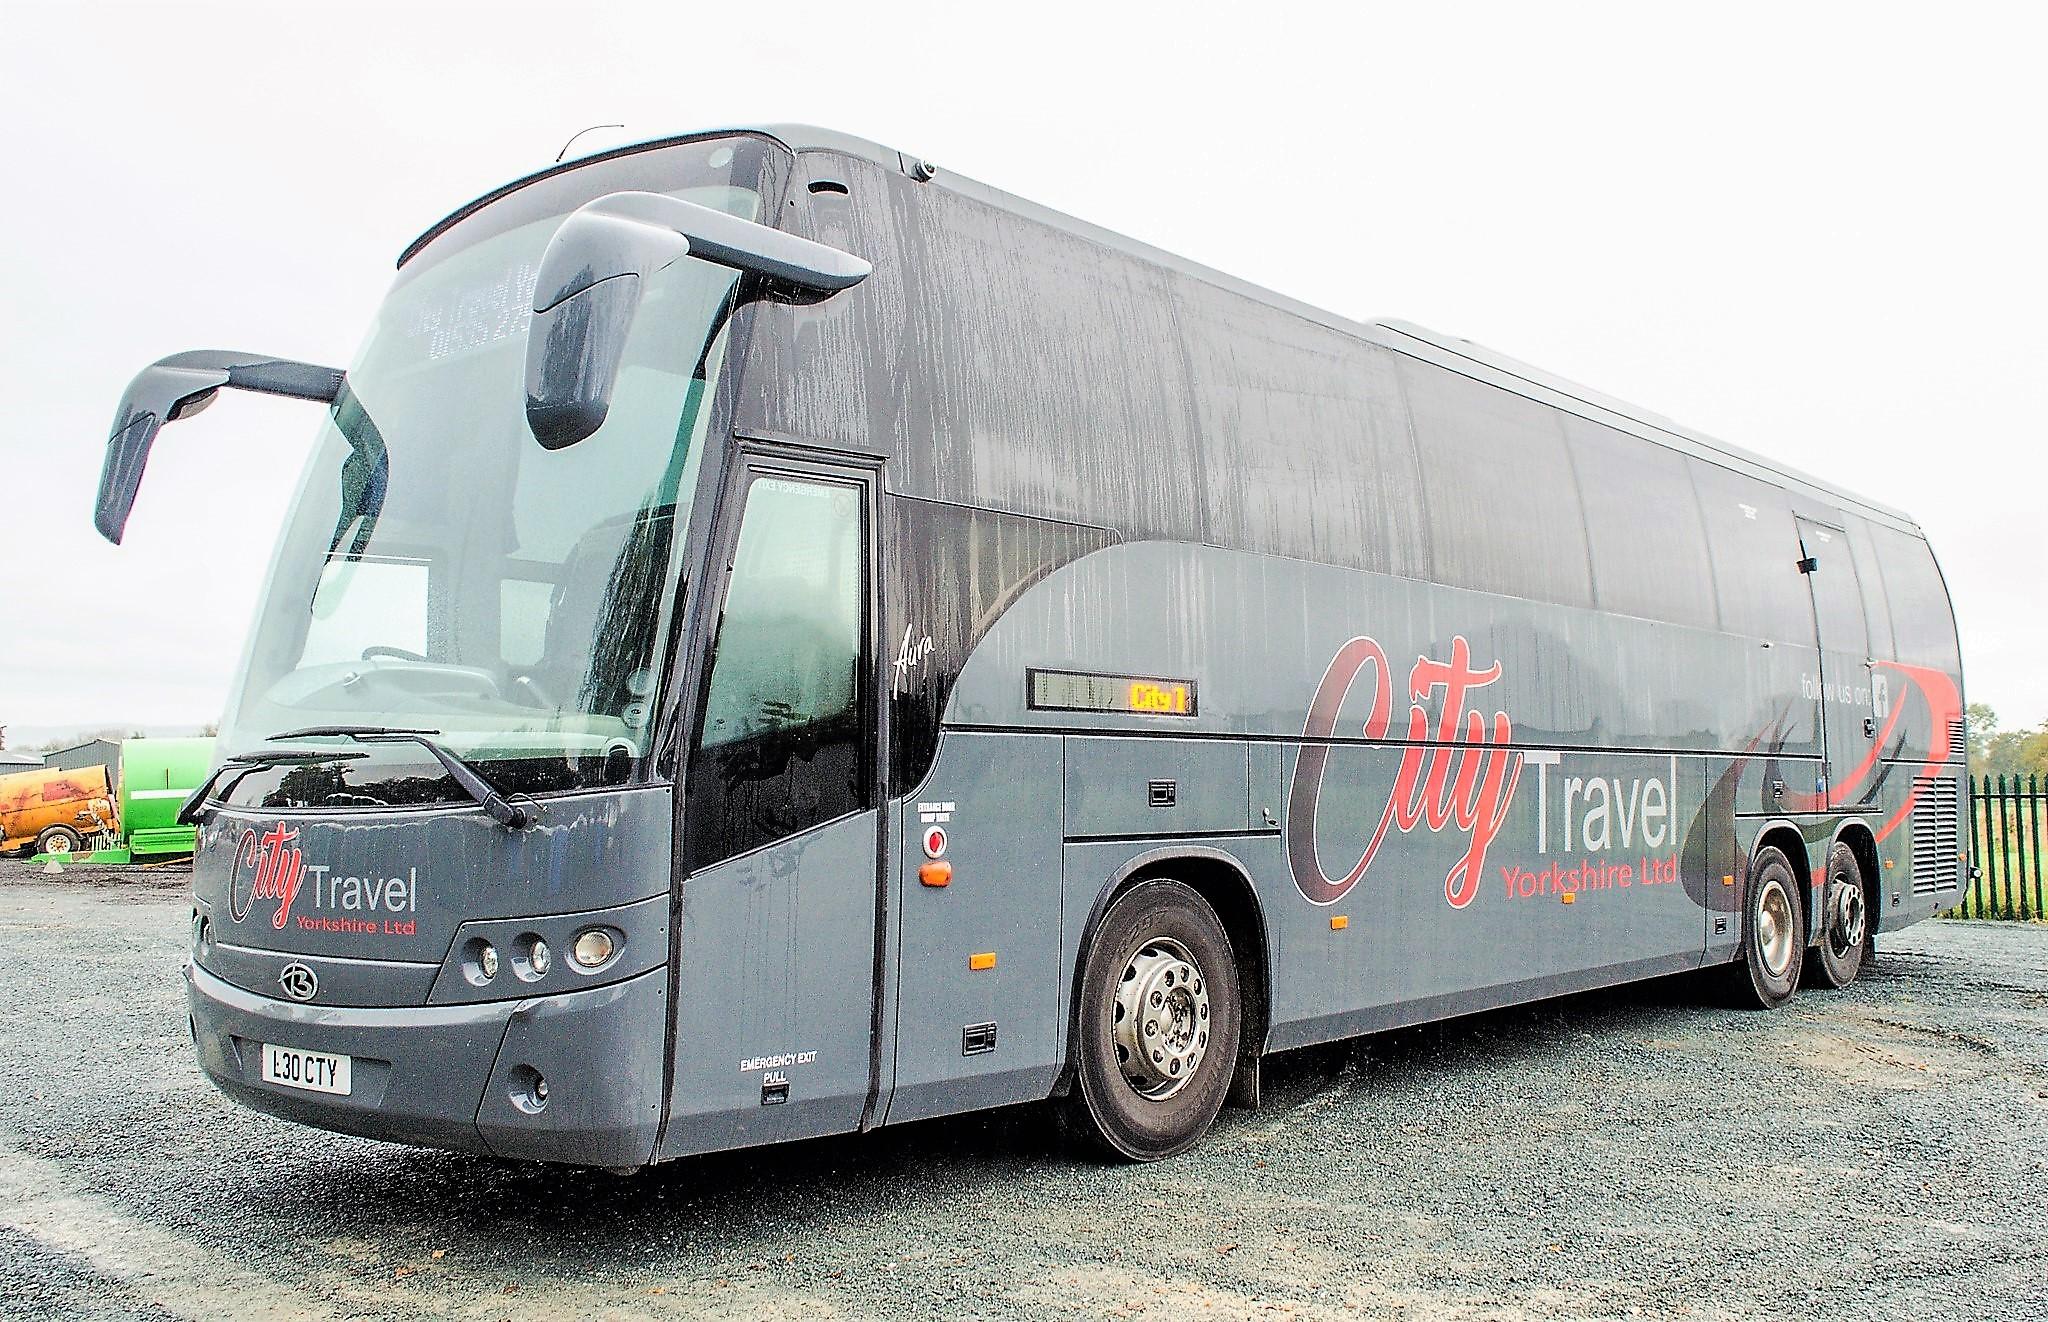 MAN F2000 Beulas Aura 54 seat luxury coach Registration Number: KC08 KTC Date of Registration: 30/